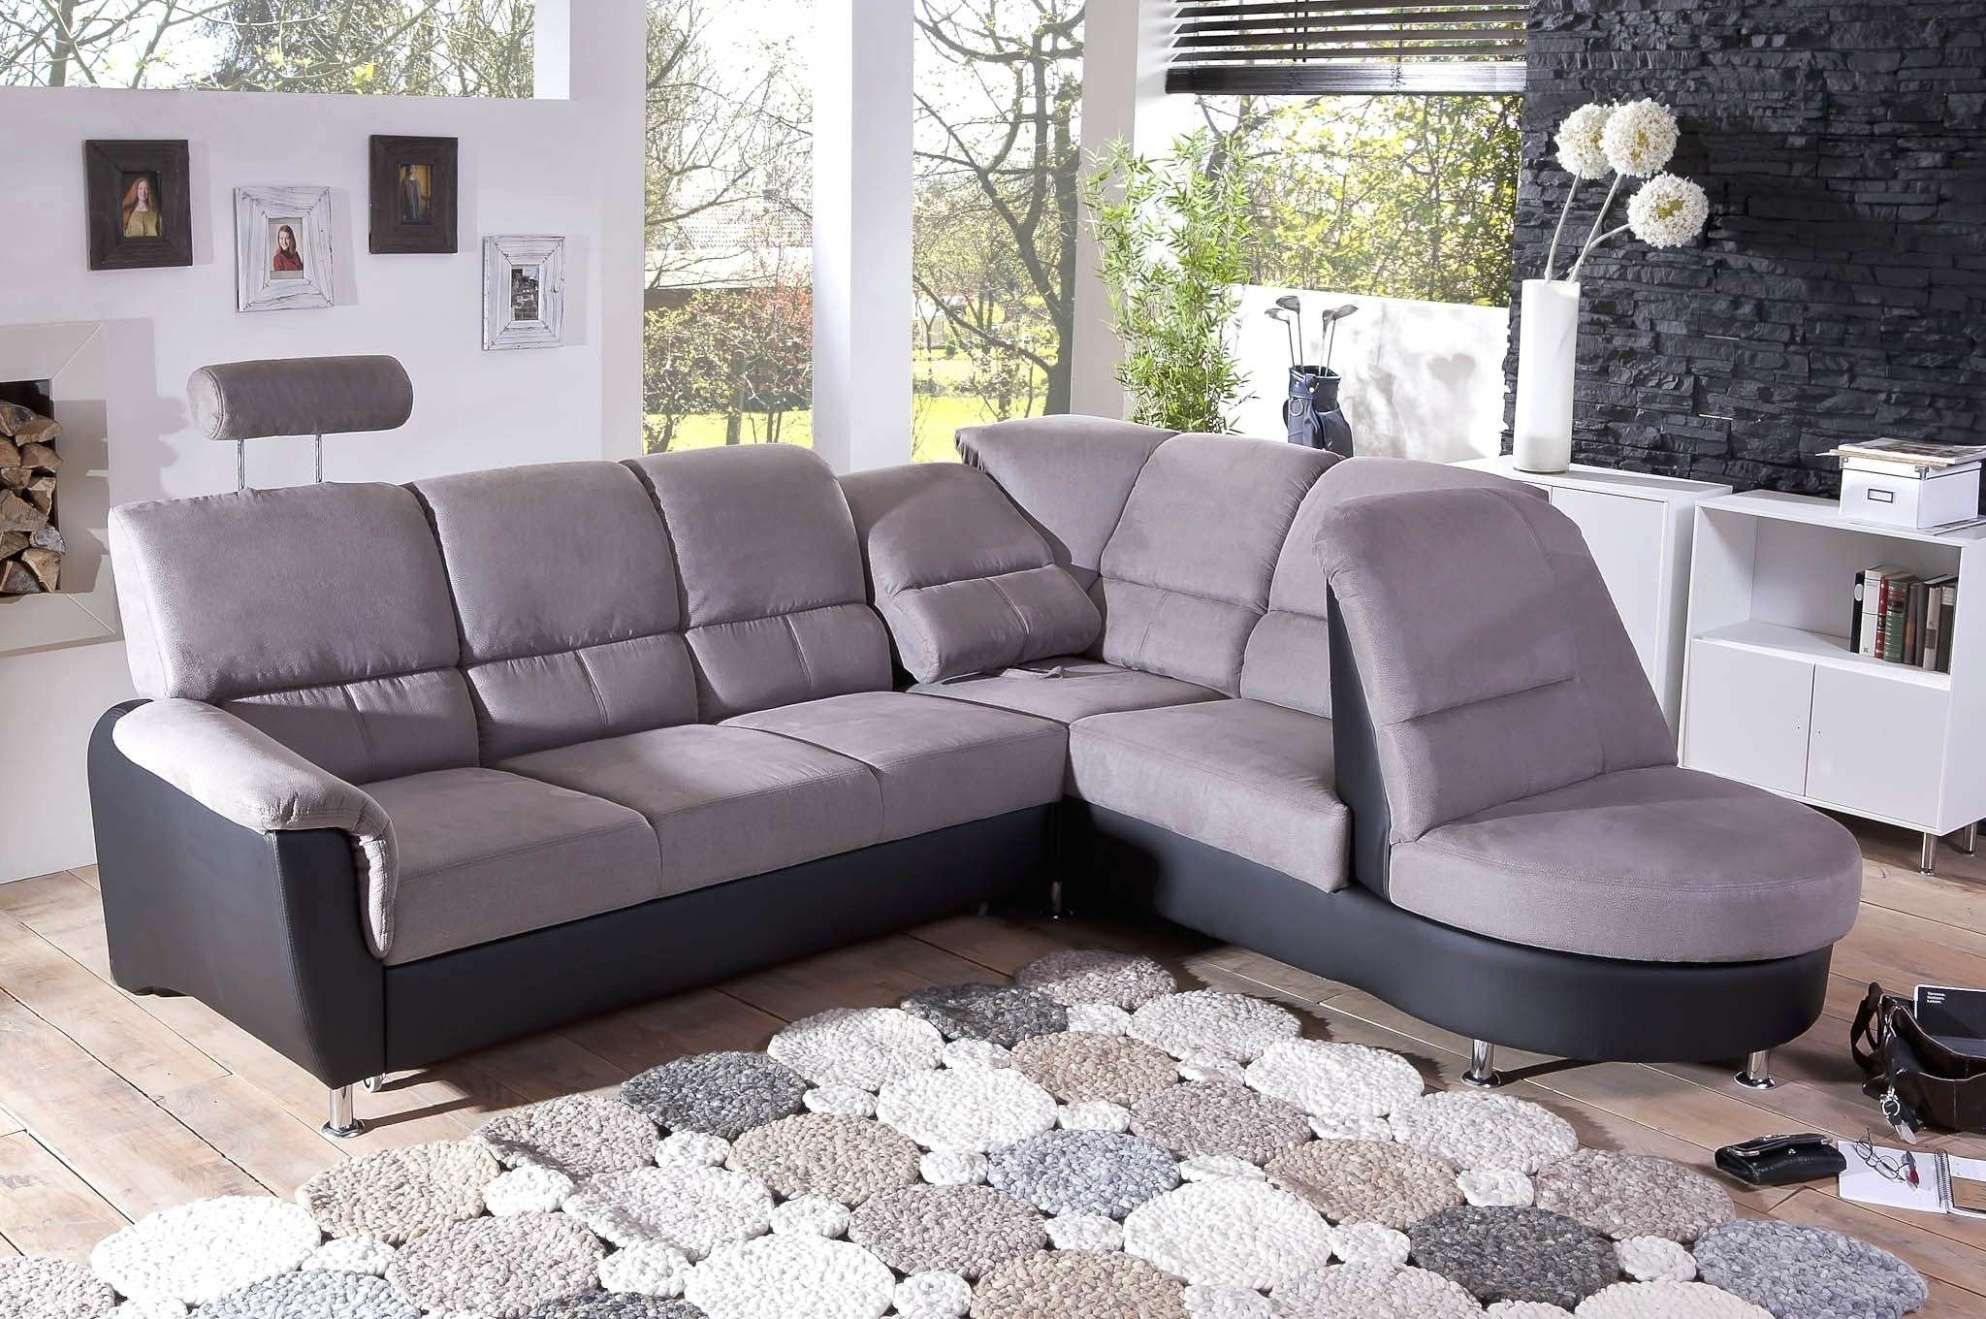 Ecksofa Kaufen Gunstig Ecksofa Leder Gunstig Yct Projekte In 2020 Sofa Design Home Home Decor